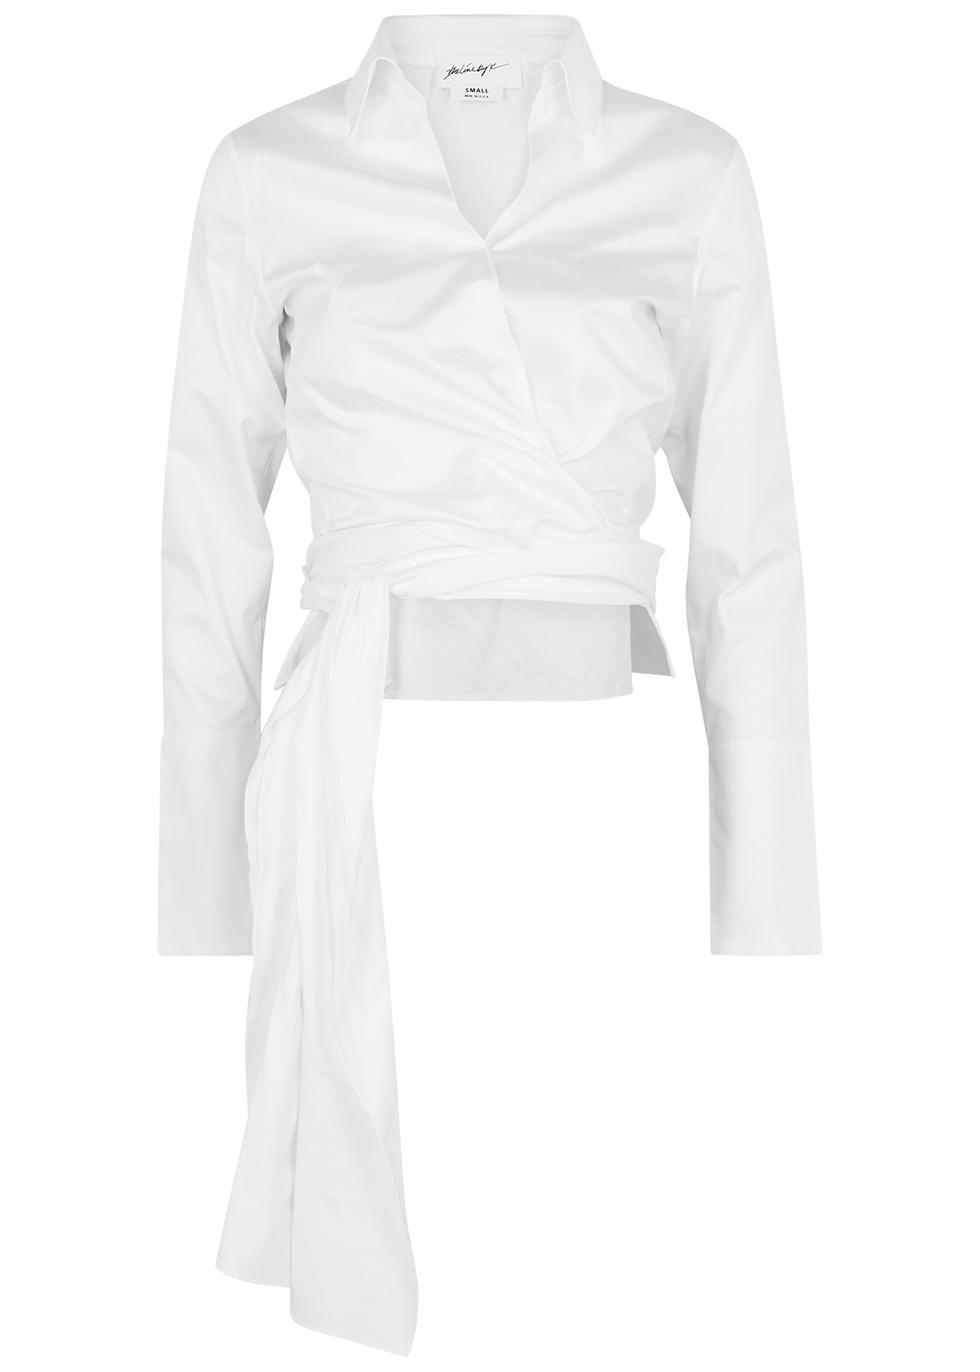 Jett white poplin wrap shirt